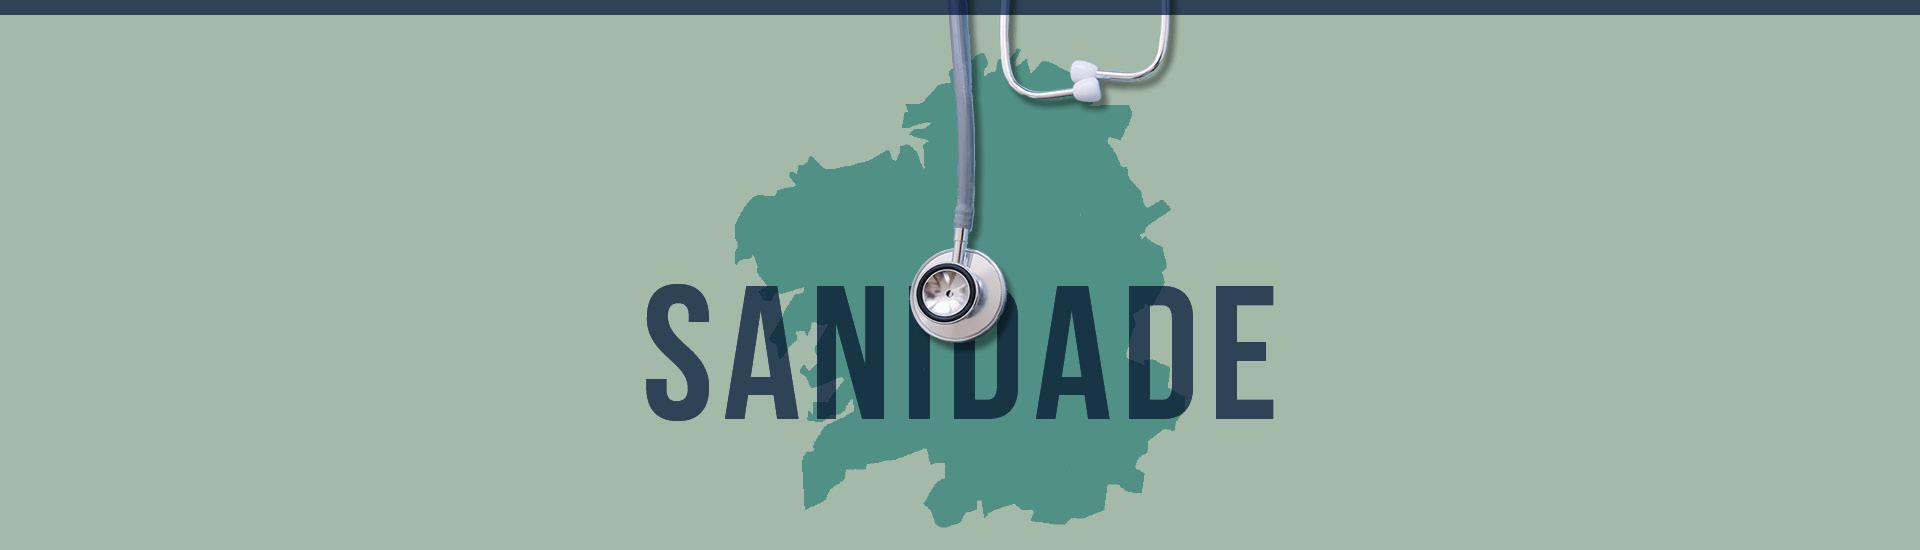 sanidade galega